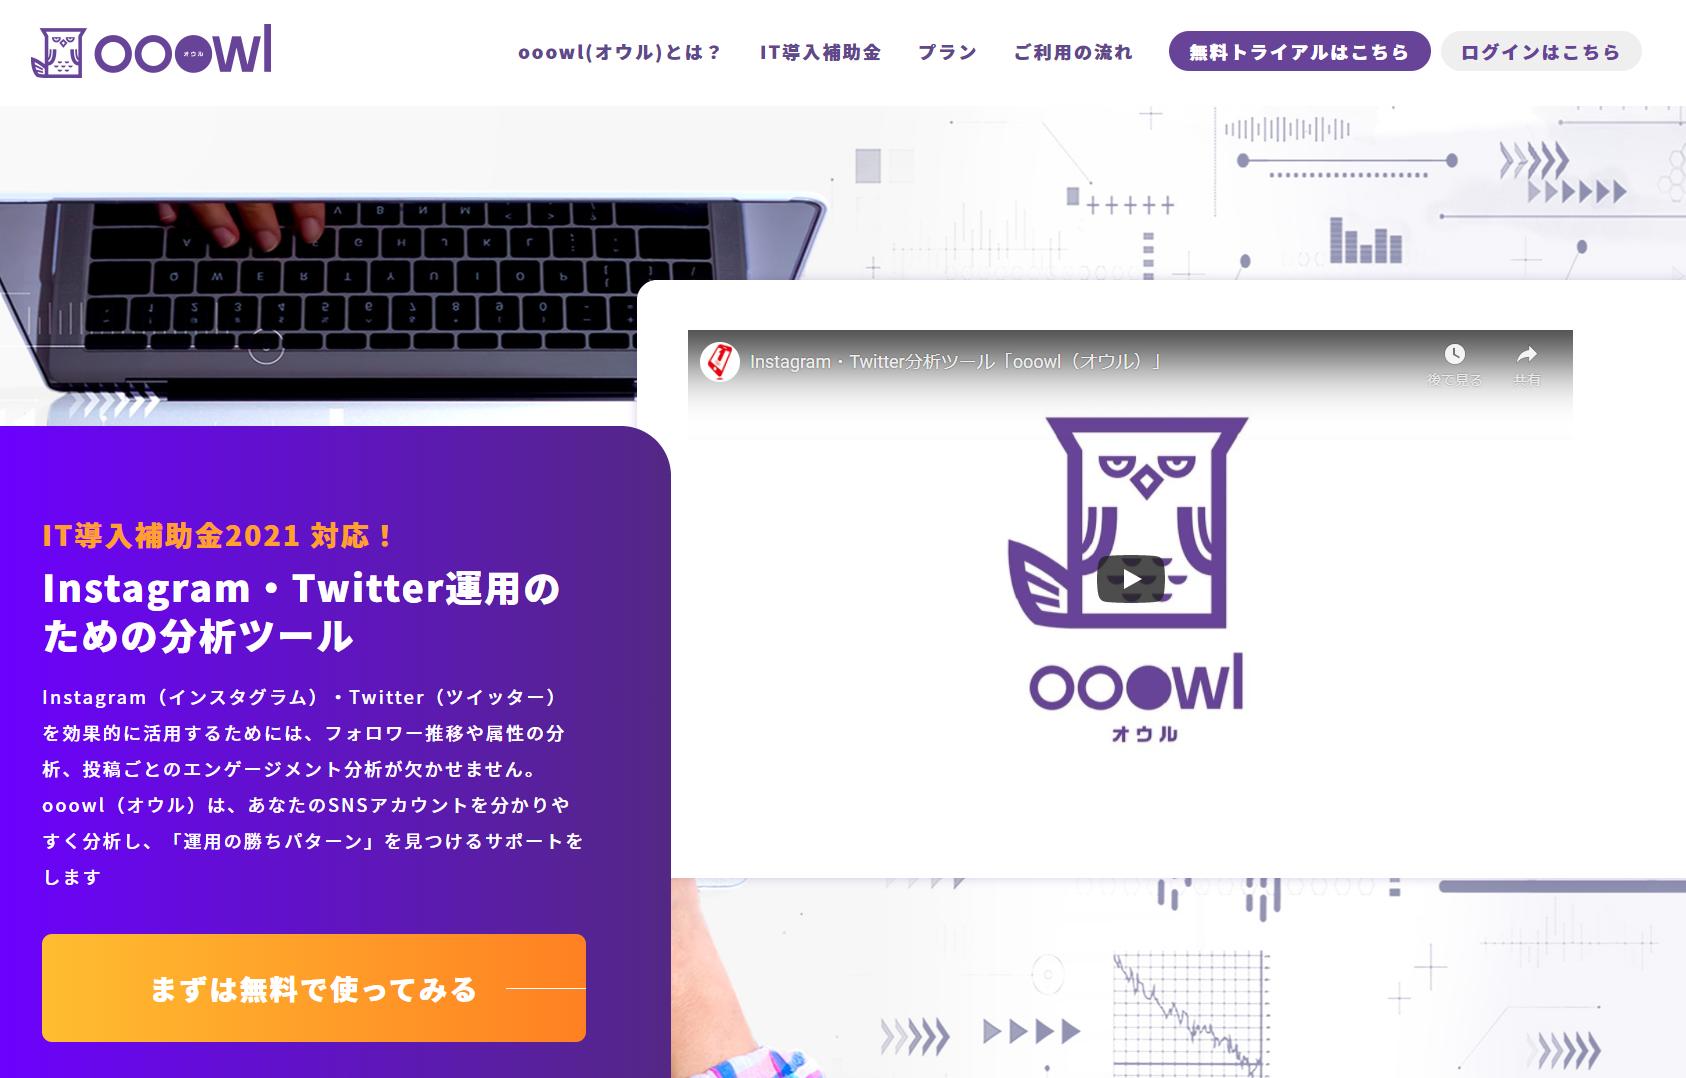 ooowl-twitter